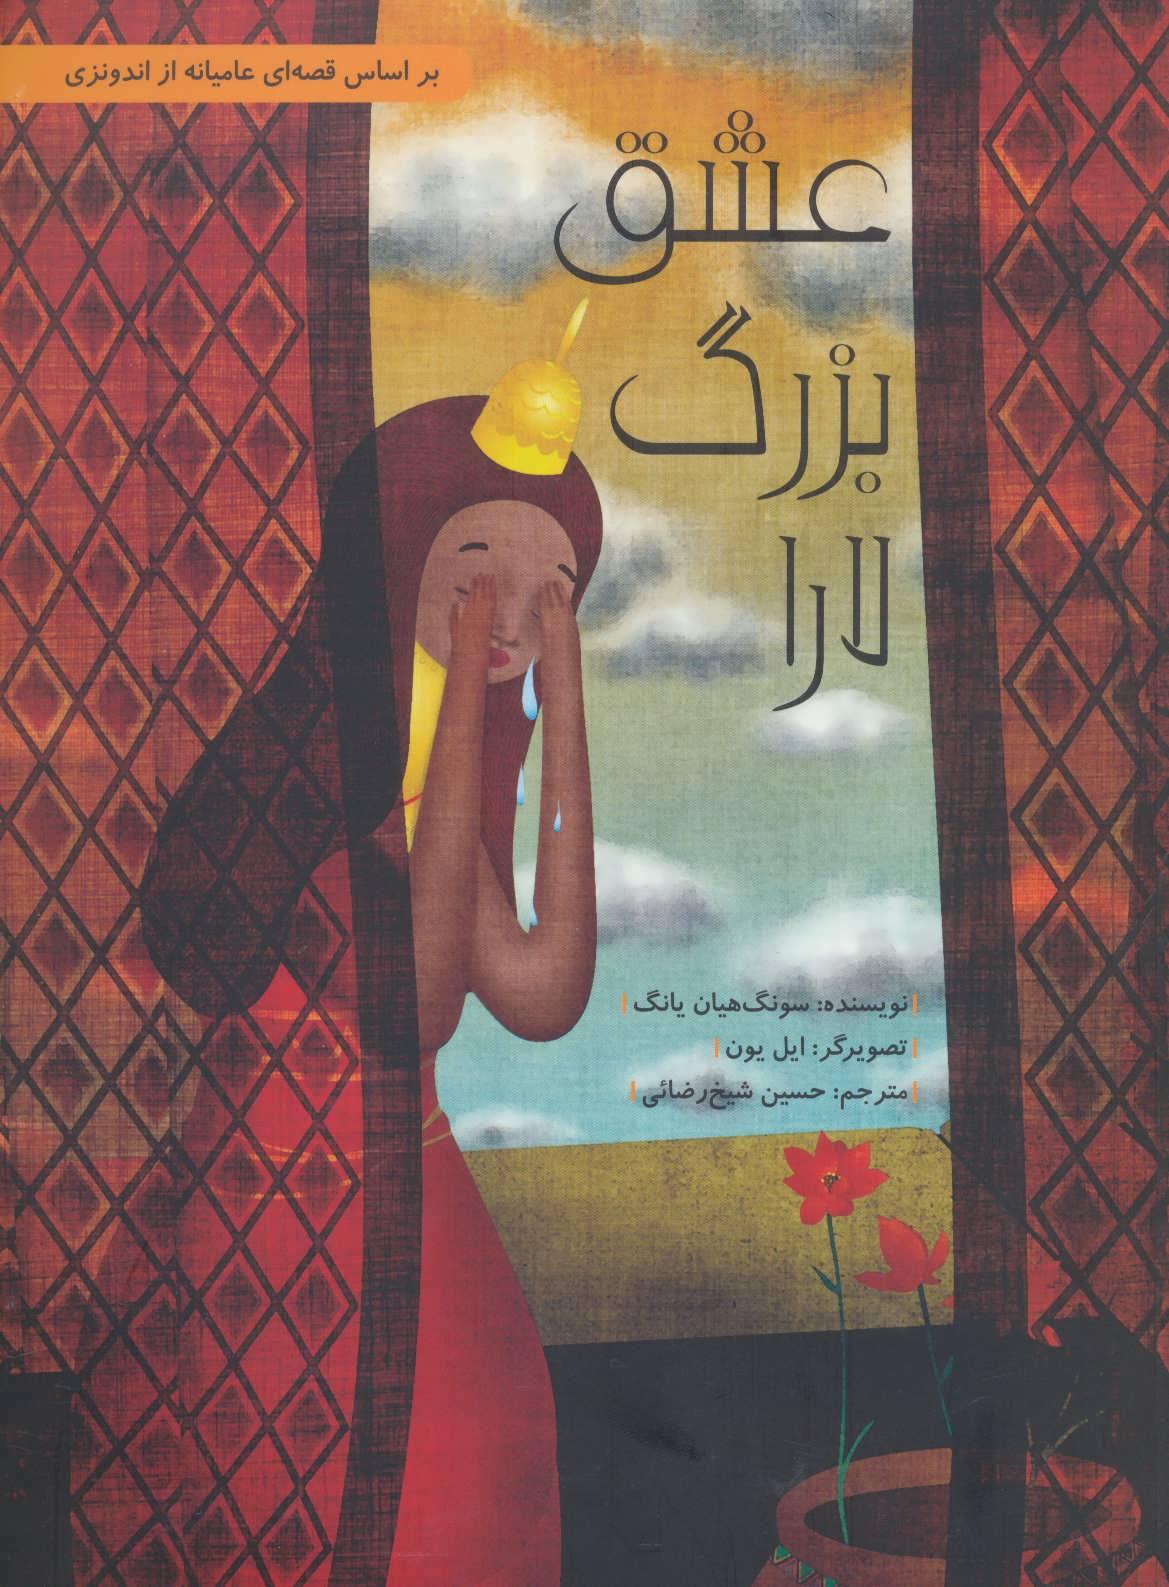 کتاب عشق بزرگ لارا